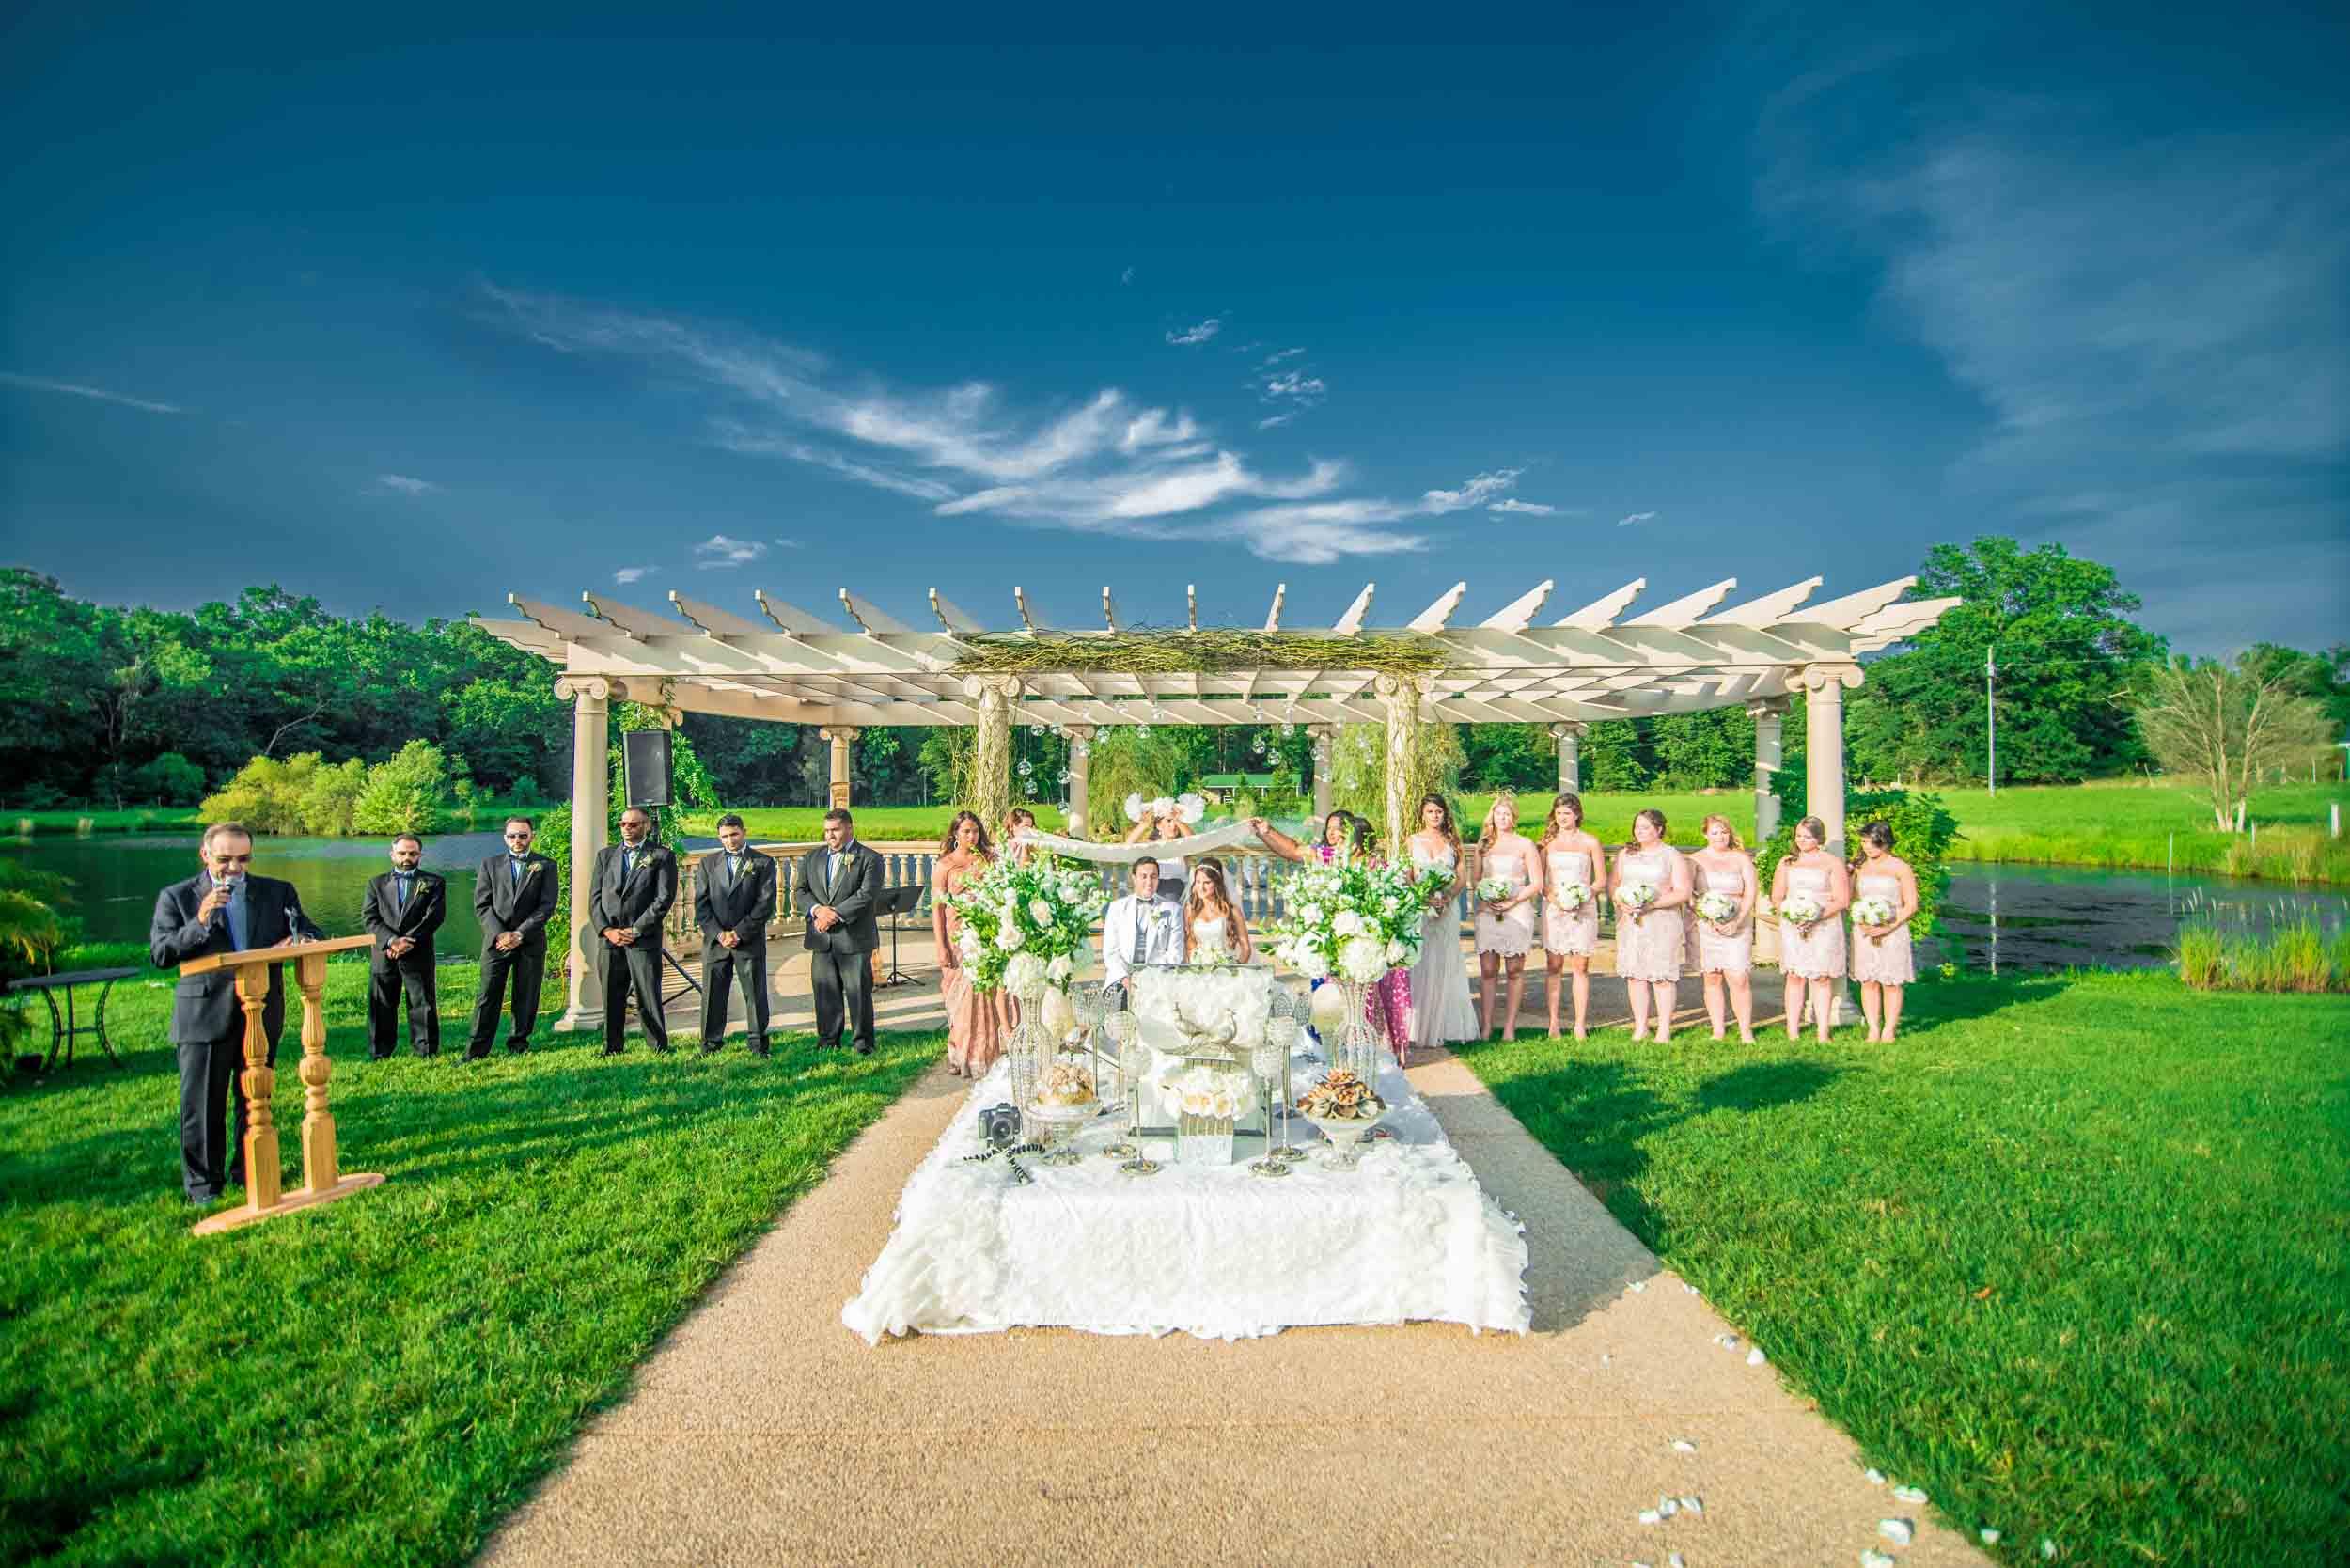 dc+metro+wedding+photographer+vadym+guliuk+photography+wedding+ceremony-2039.jpg